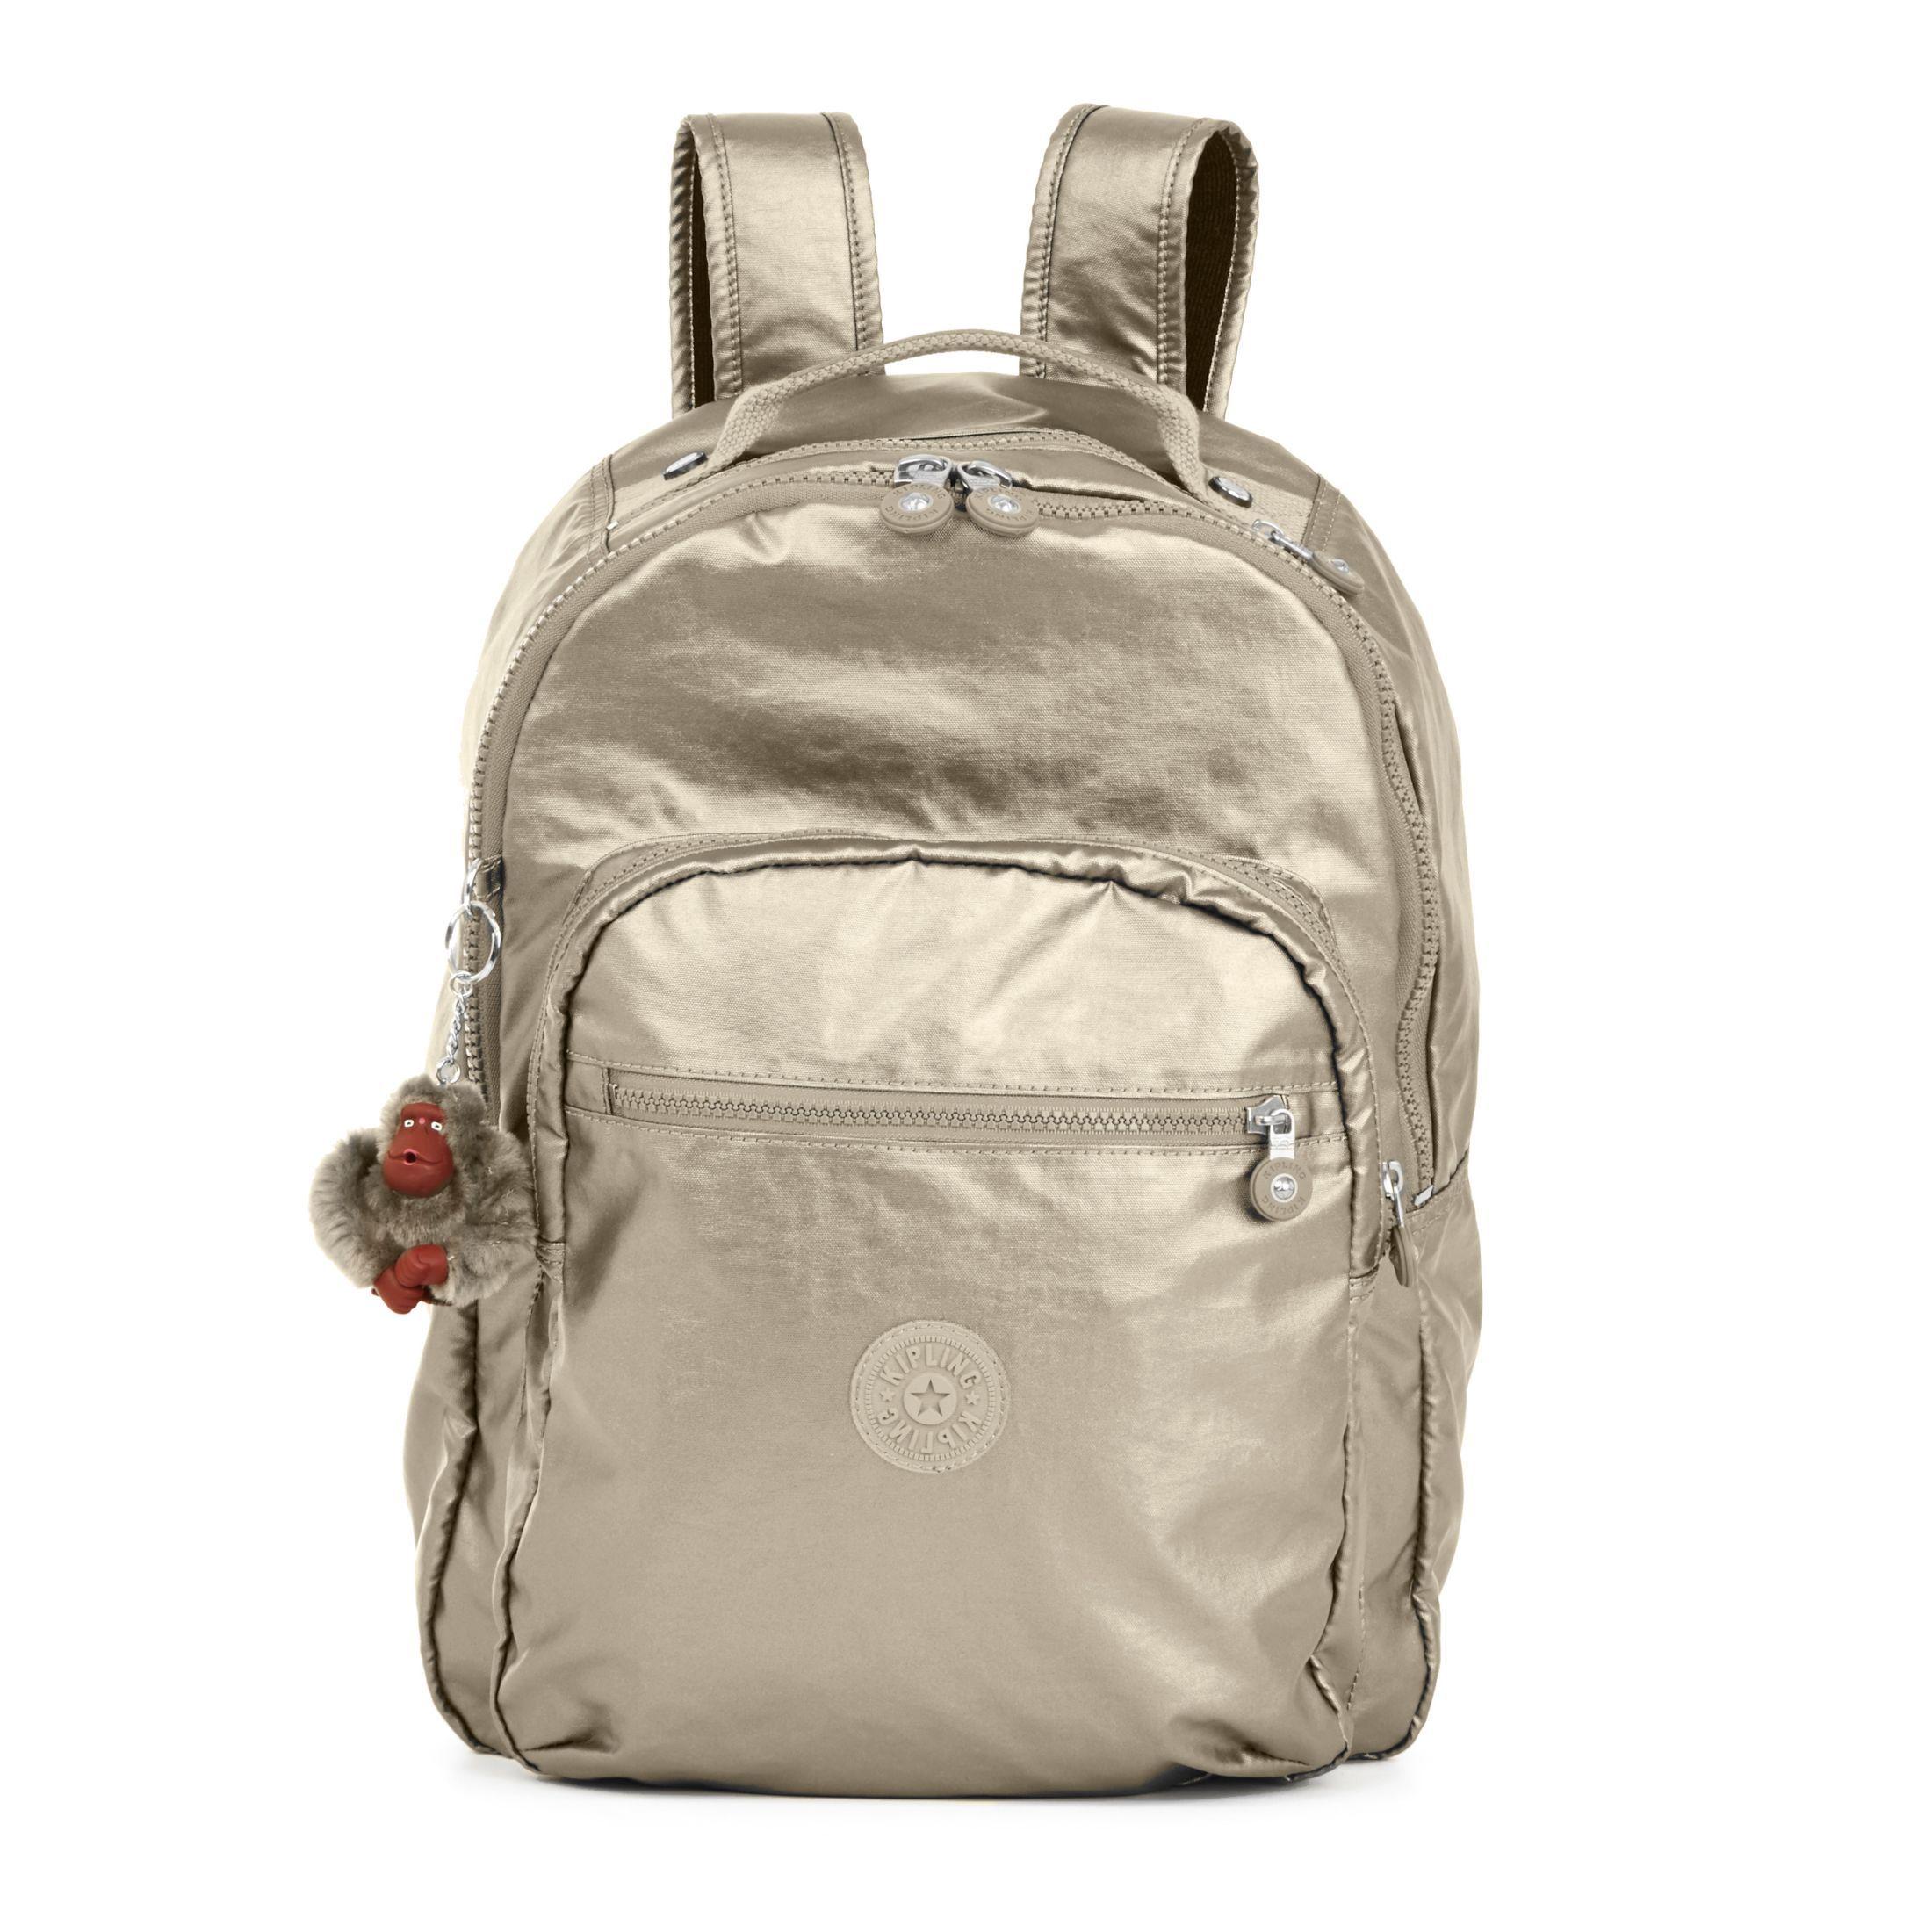 Seoul Large Metallic Laptop Backpack | Mochilas, Mochilas